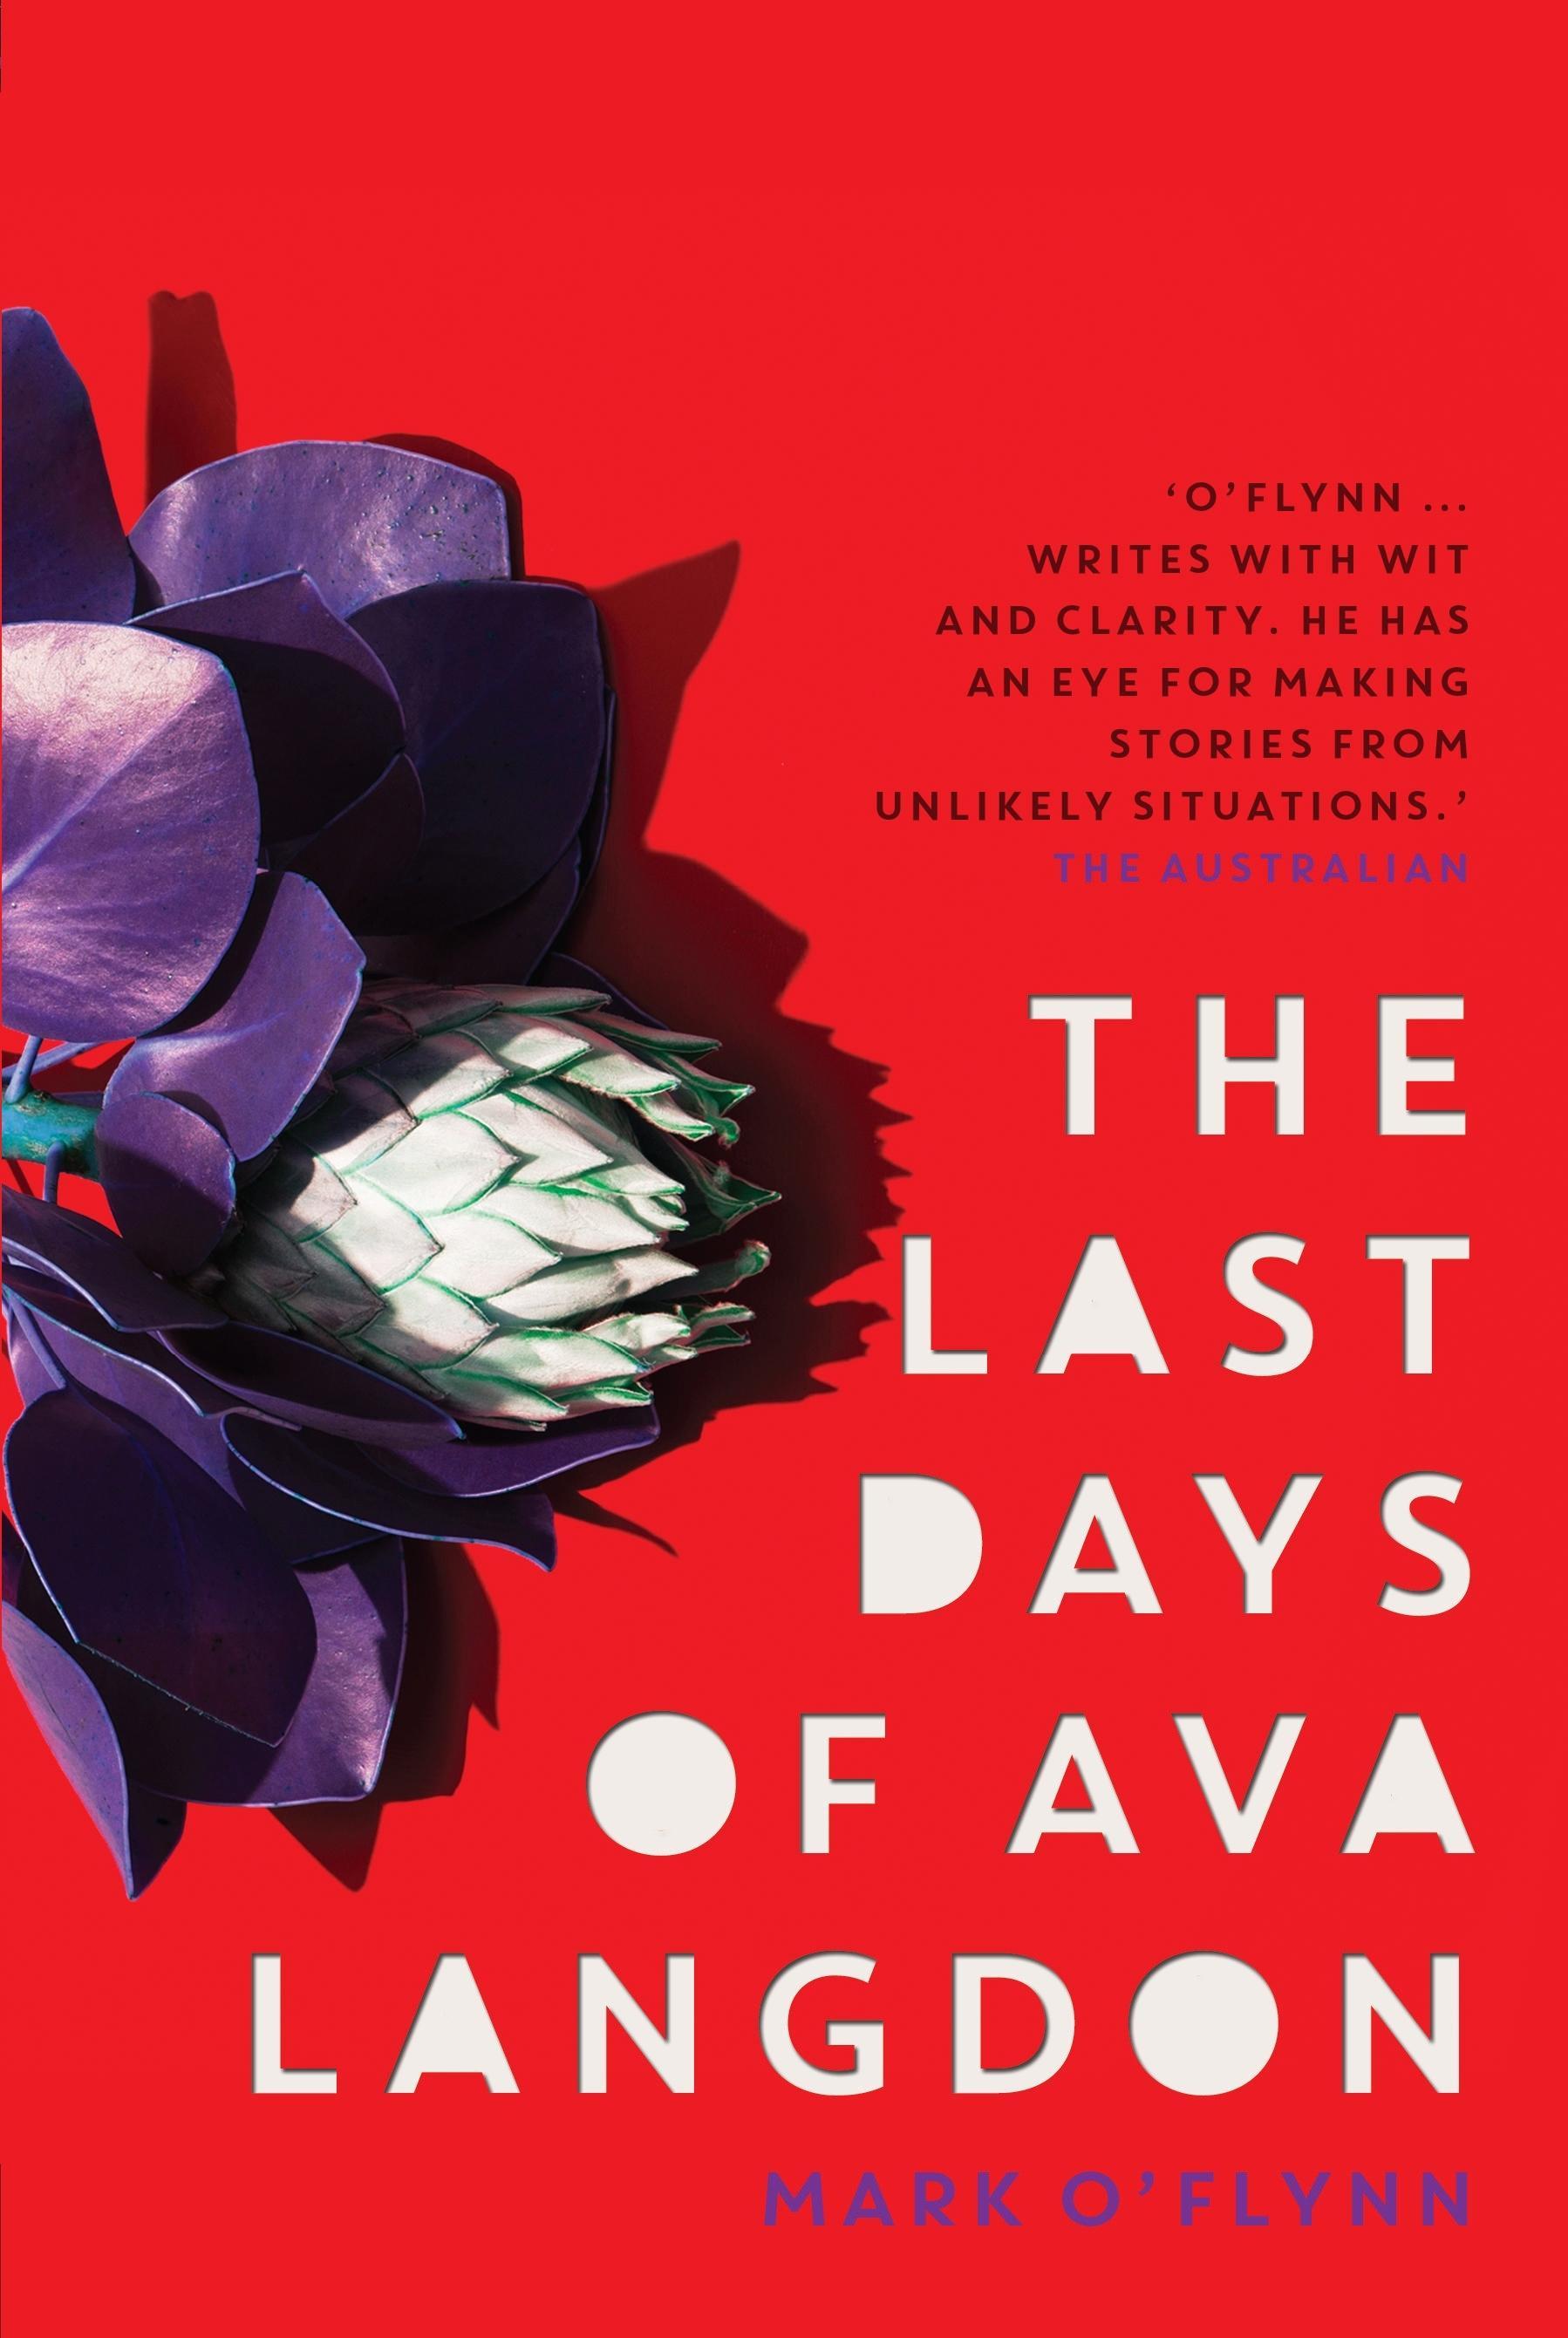 The Last Days OfAvaLangdon